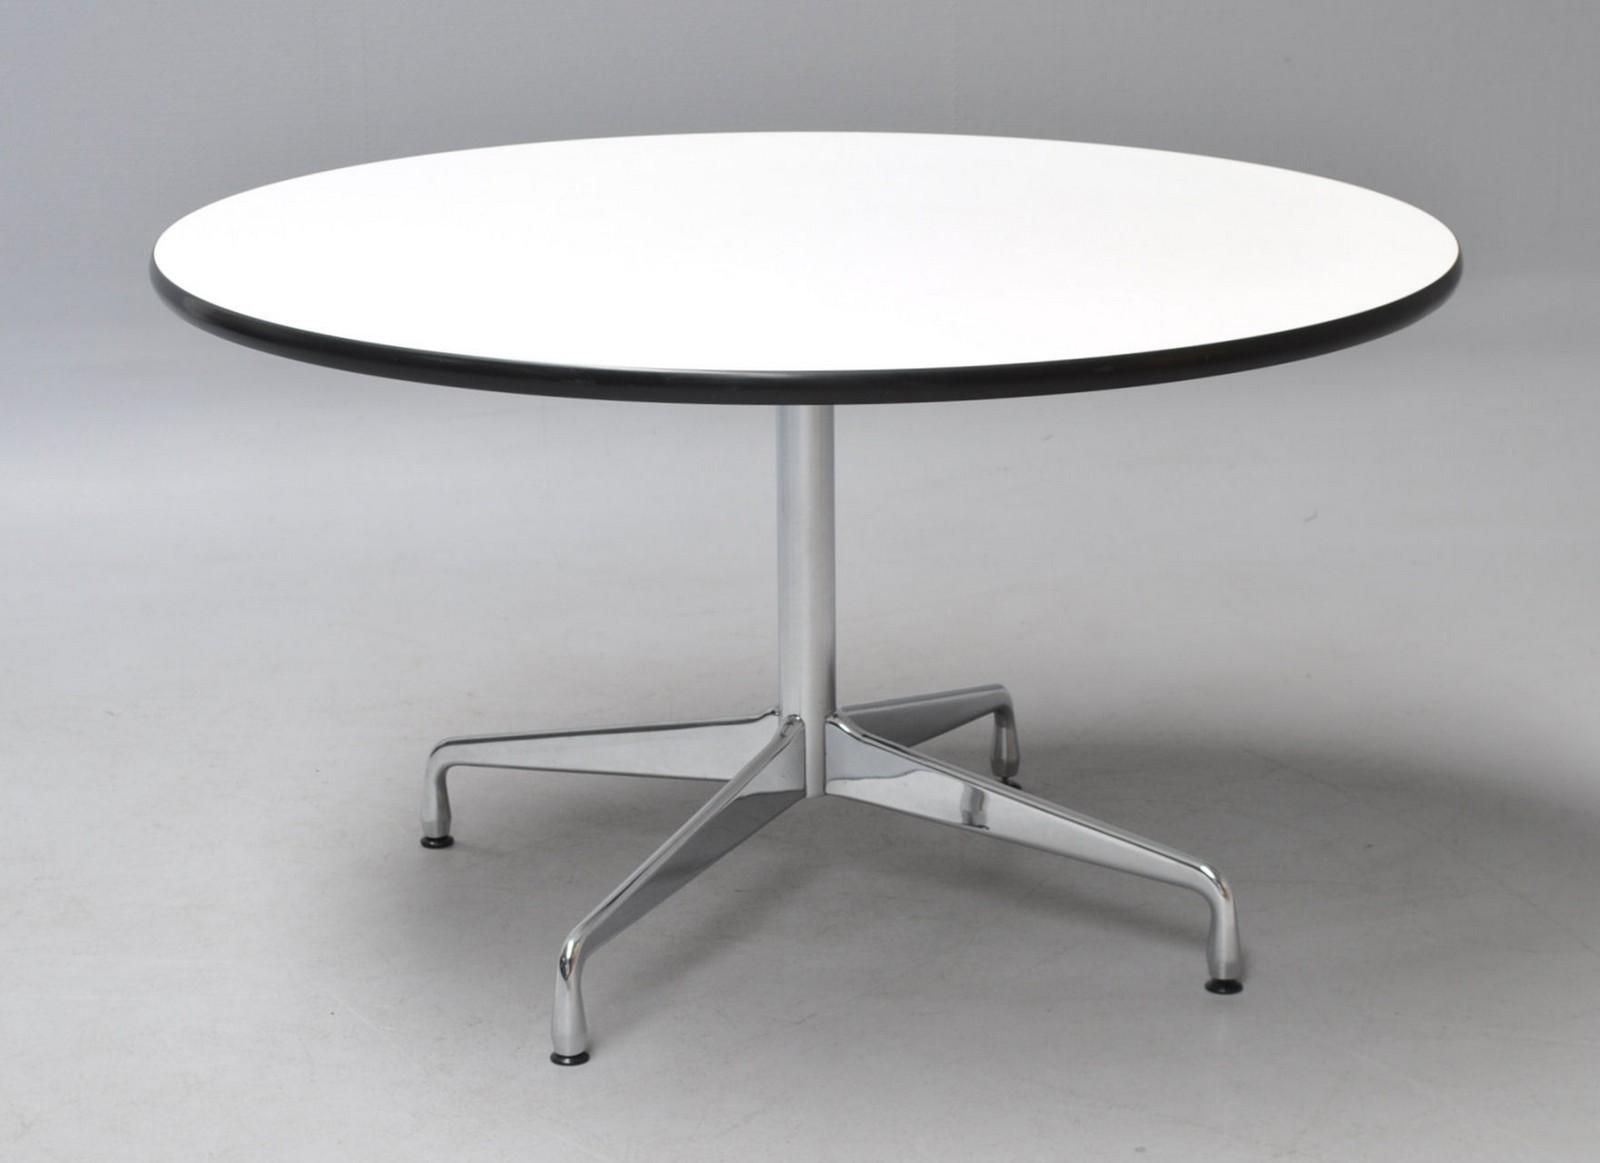 Charles Eames. Rundt spisebord 'Segmented Table'. Hvid